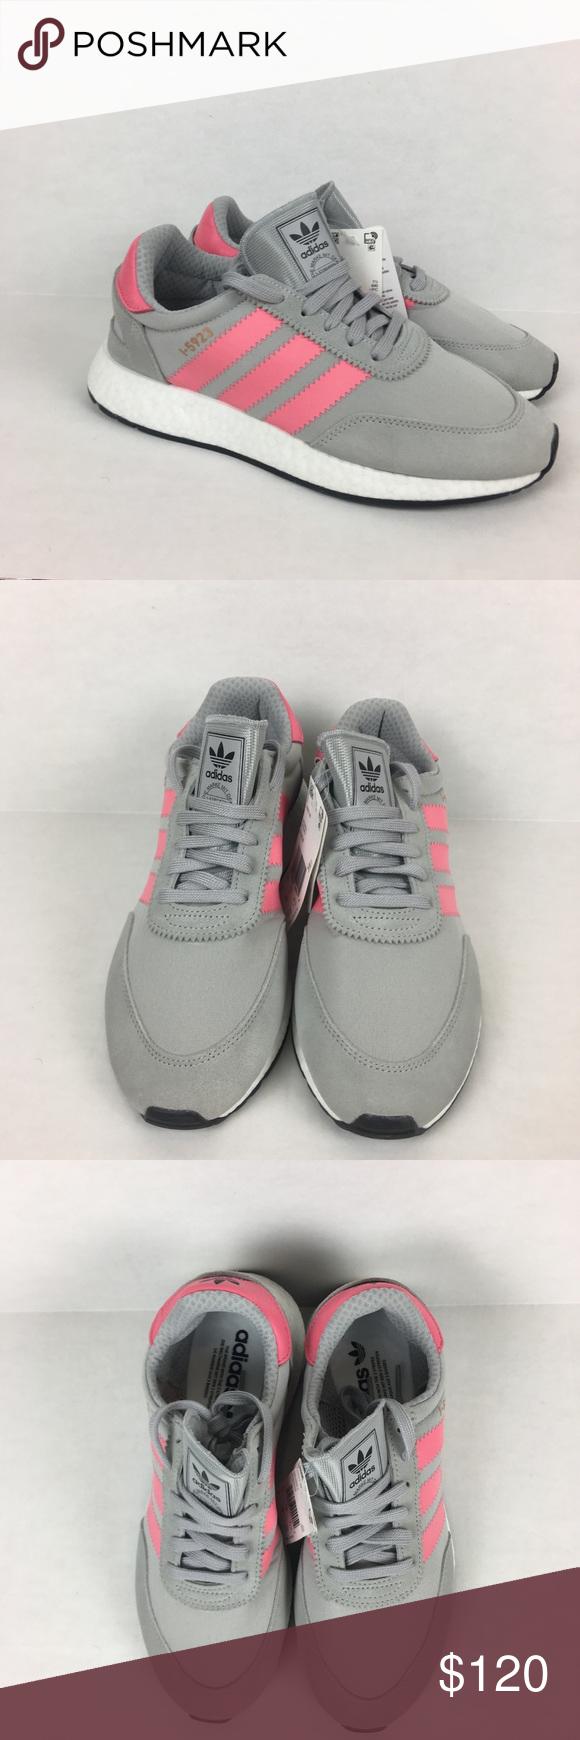 f8768379b0a Adidas Originals I-5923W Adidas originals I-5923 Condition. New in box.  Never worn. Color. Grey